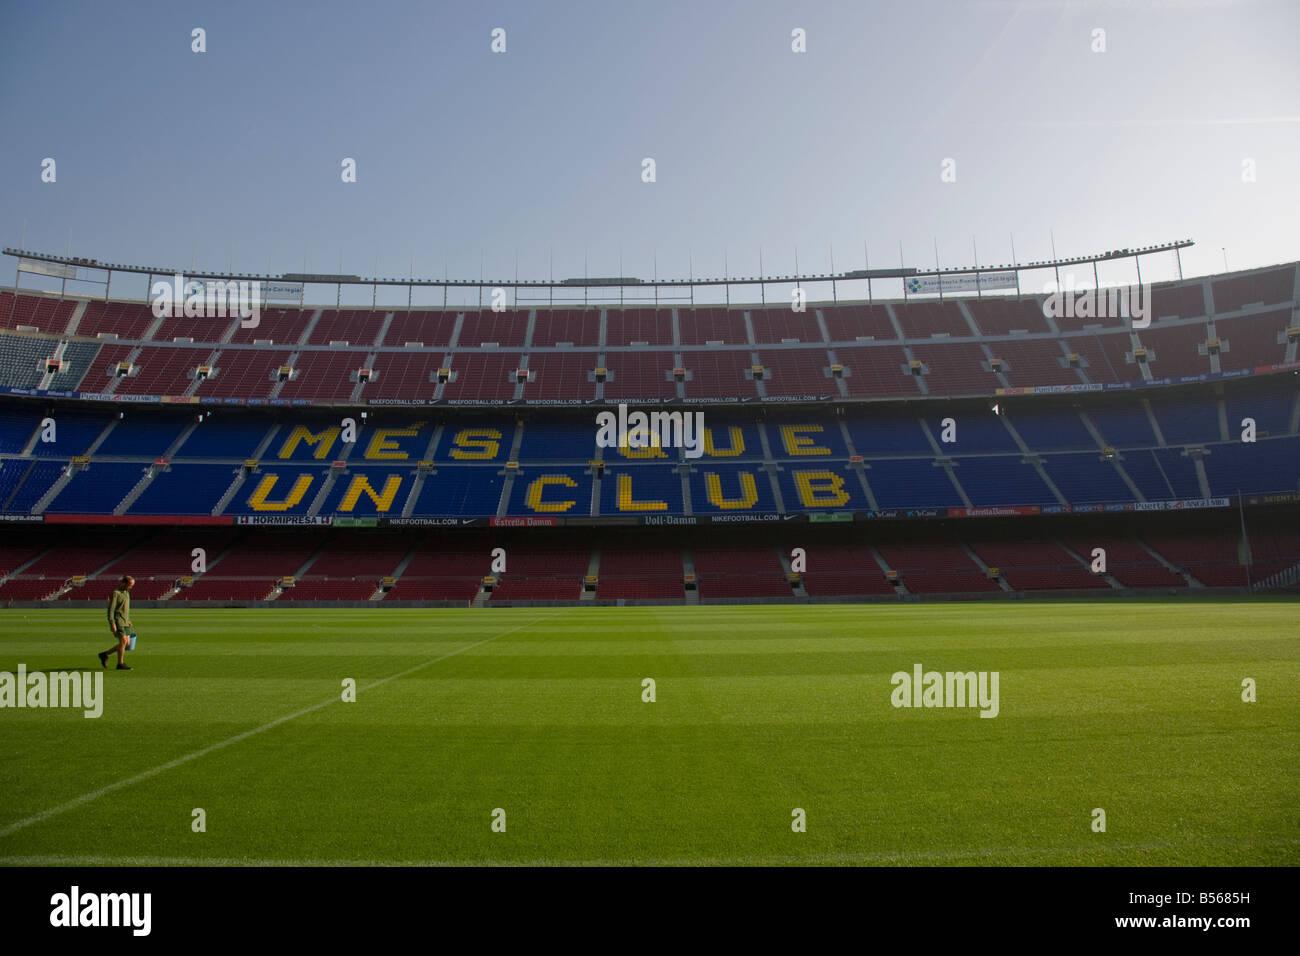 CAMP NOU FC BARCELONA FOOTBALL STADIUM BARCELONAFC FCBARCELONA SPAIN - Stock Image